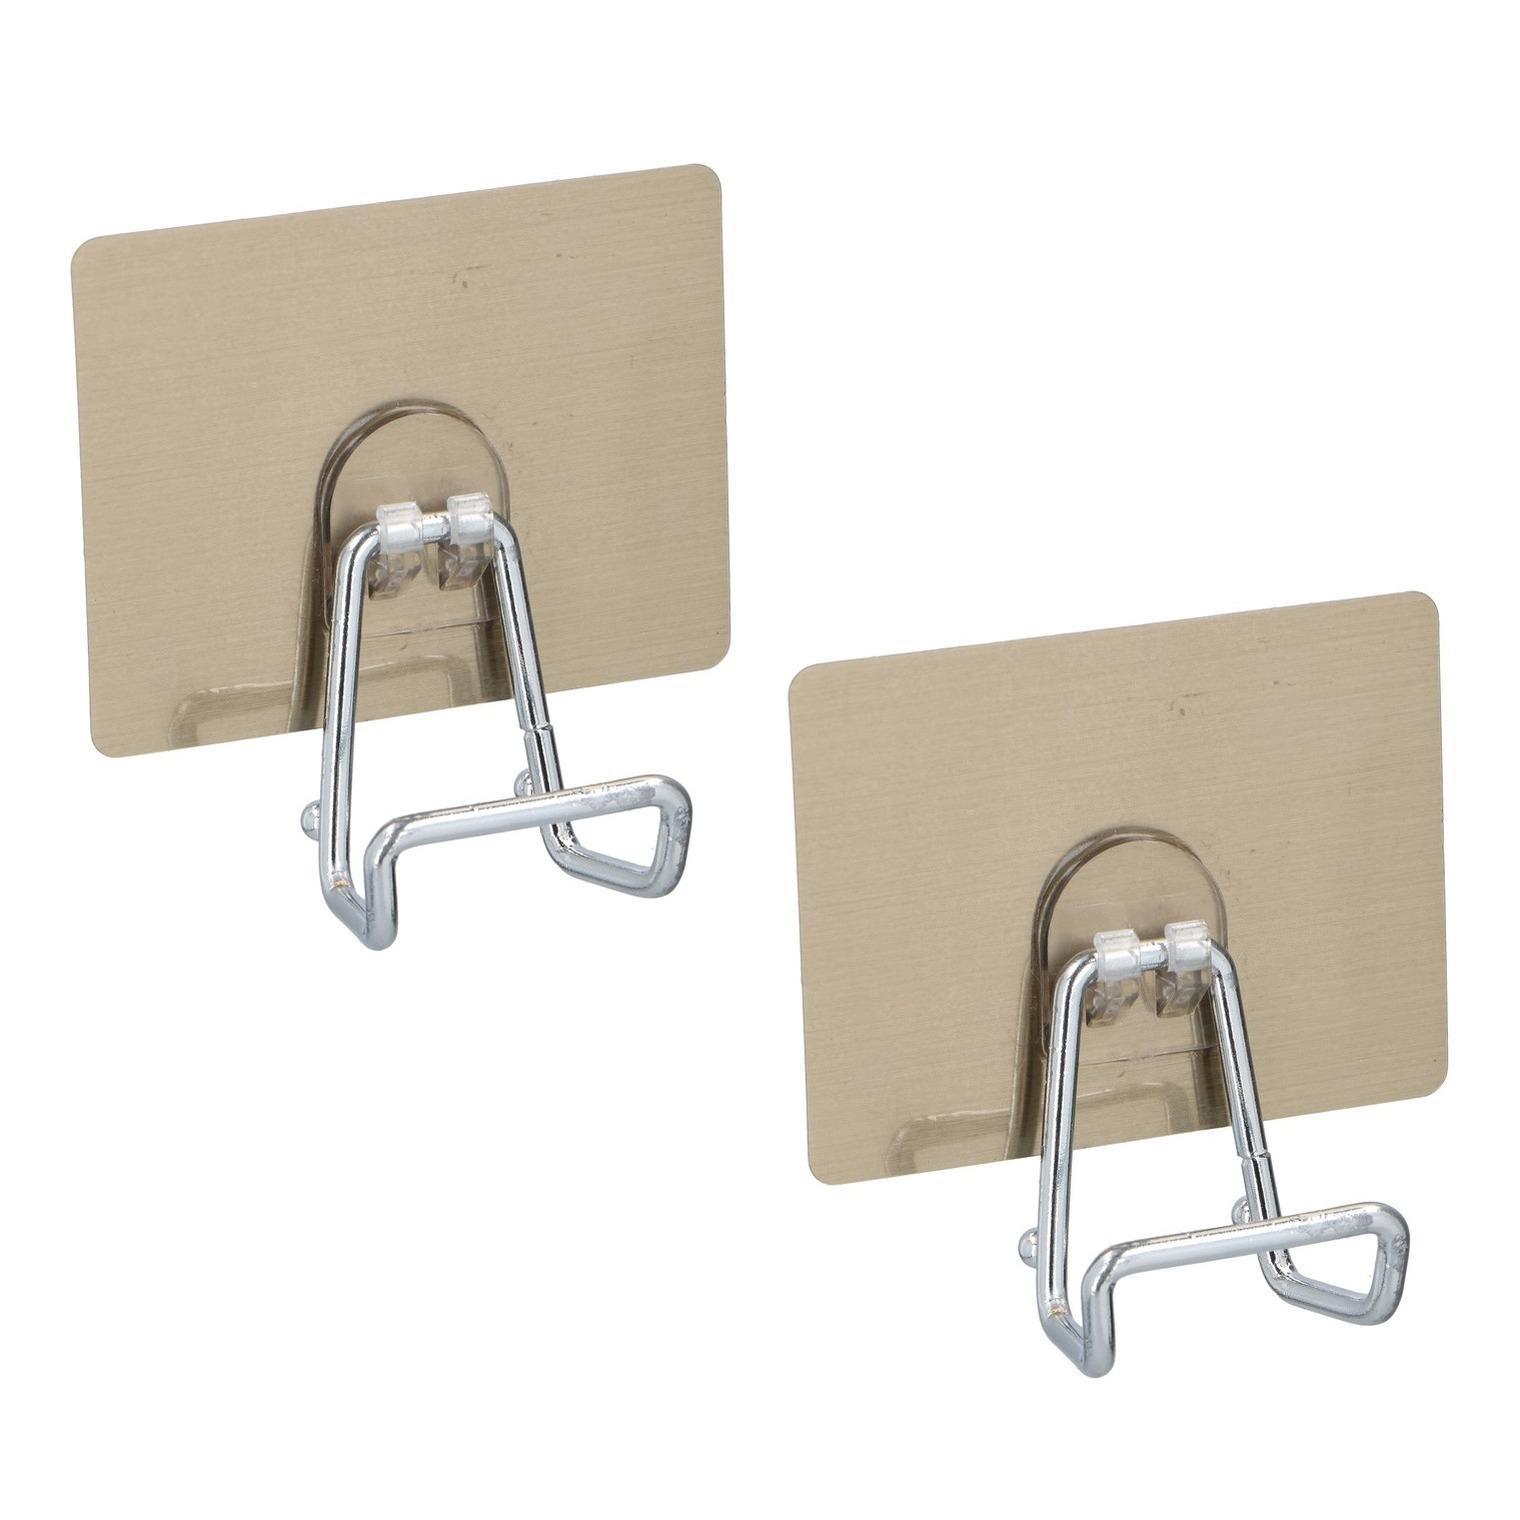 4x stuks zelfklevende badkamer handdoek ophanghaak 9 5 cm